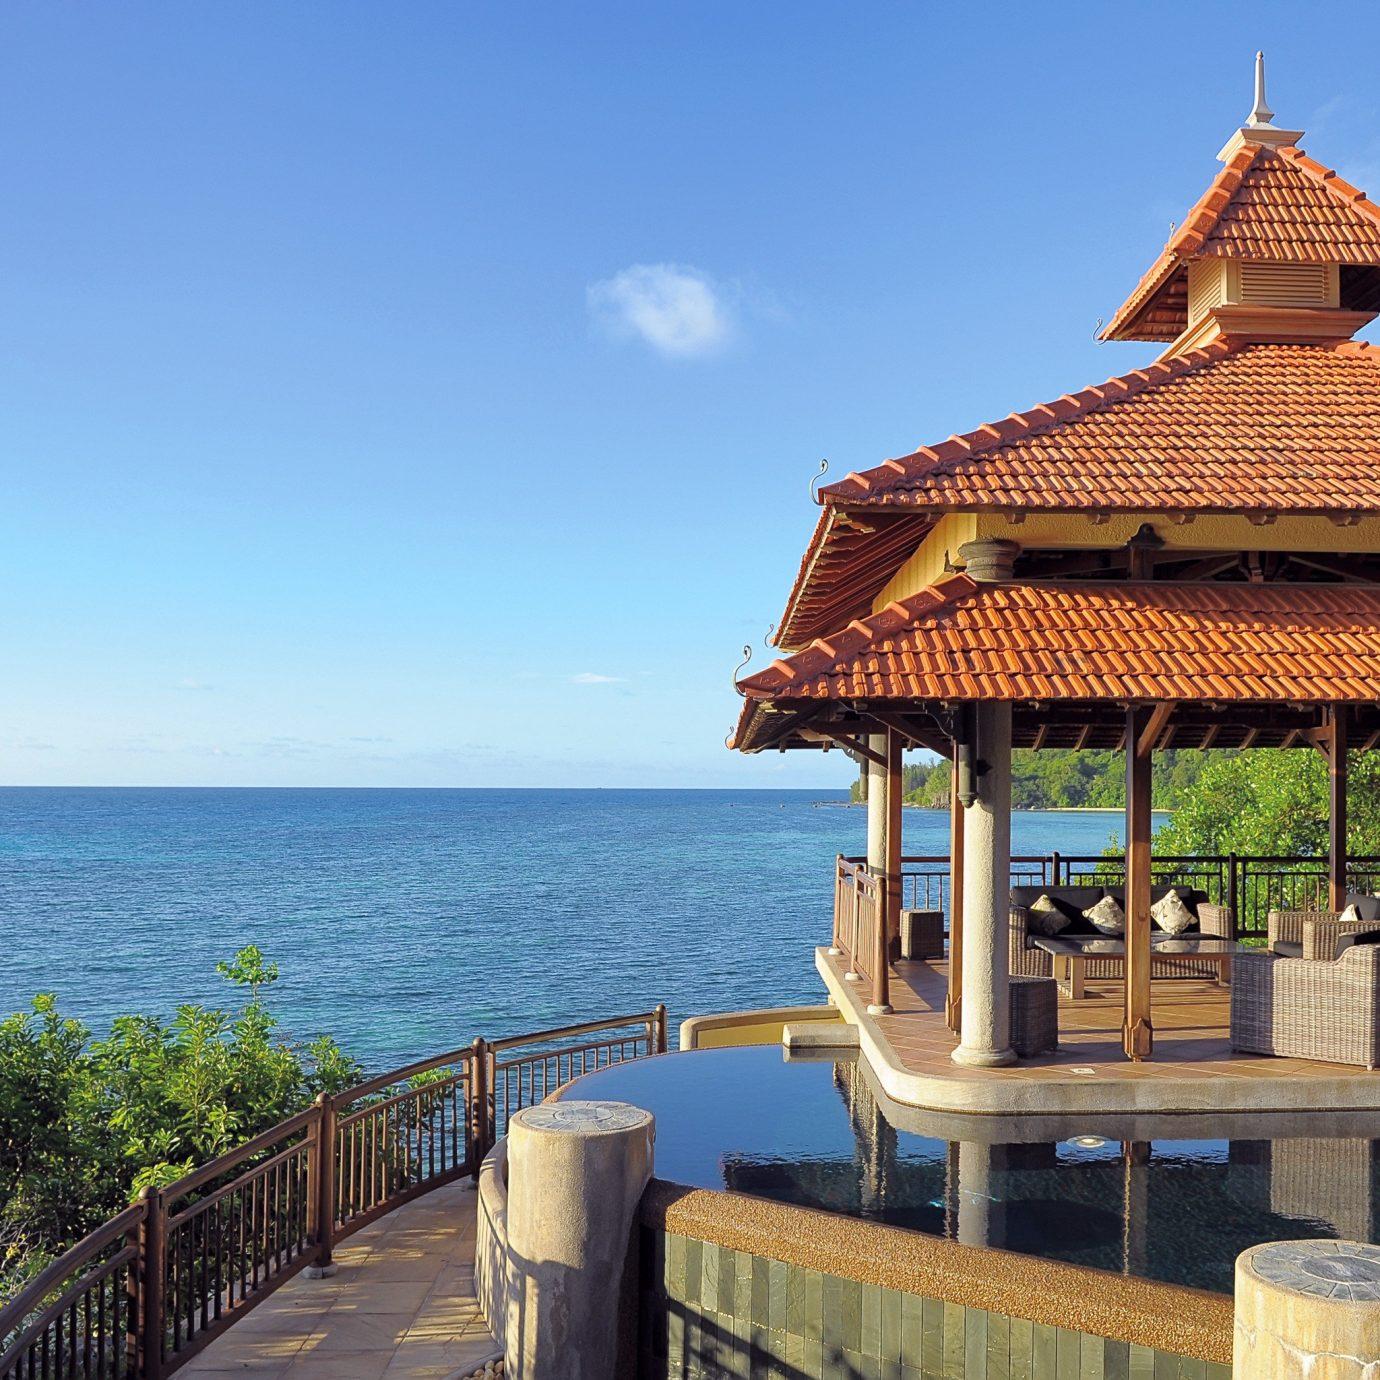 Architecture Beach Beachfront Buildings Exterior Resort sky water overlooking wooden Sea pier tower travel